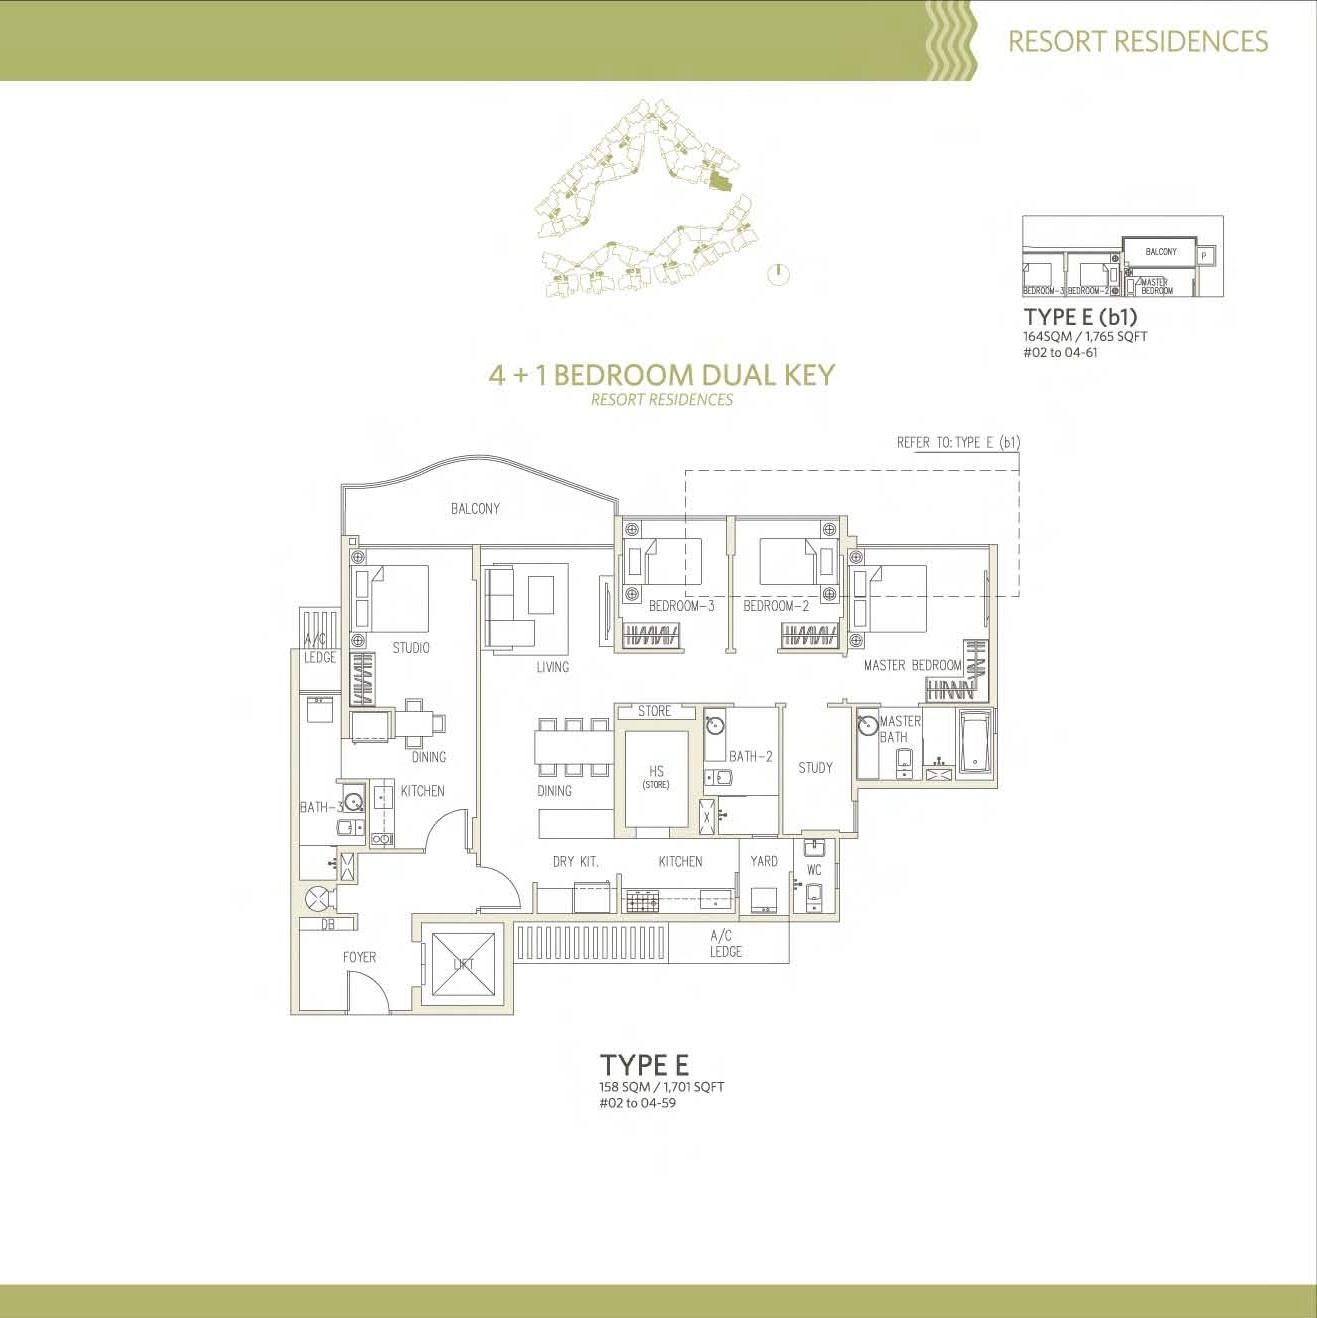 Canberra Residences 4 Bedroom + Study Dual Key Floor Plans Type E, E(b1)